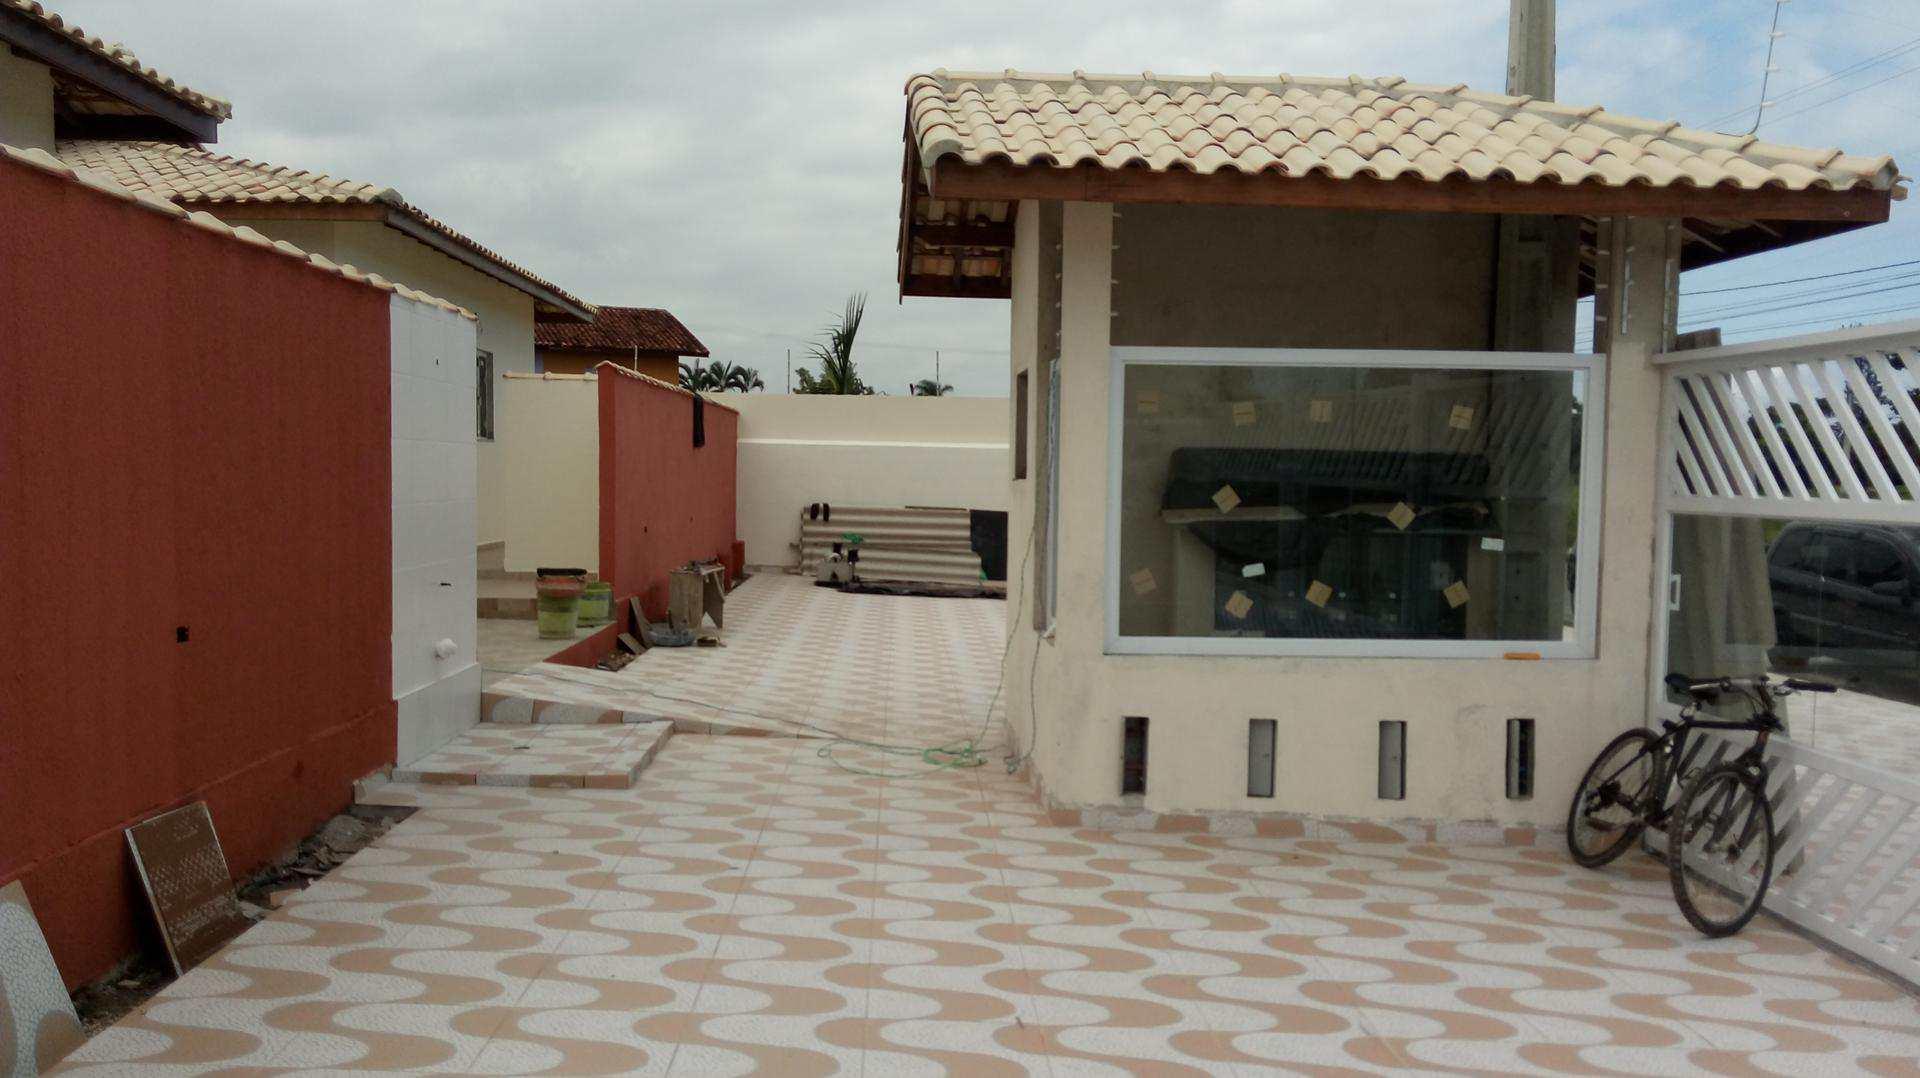 Casa de Condomínio com 2 dorms, Cibratel II, Itanhaém - R$ 240 mil, Cod: 5201